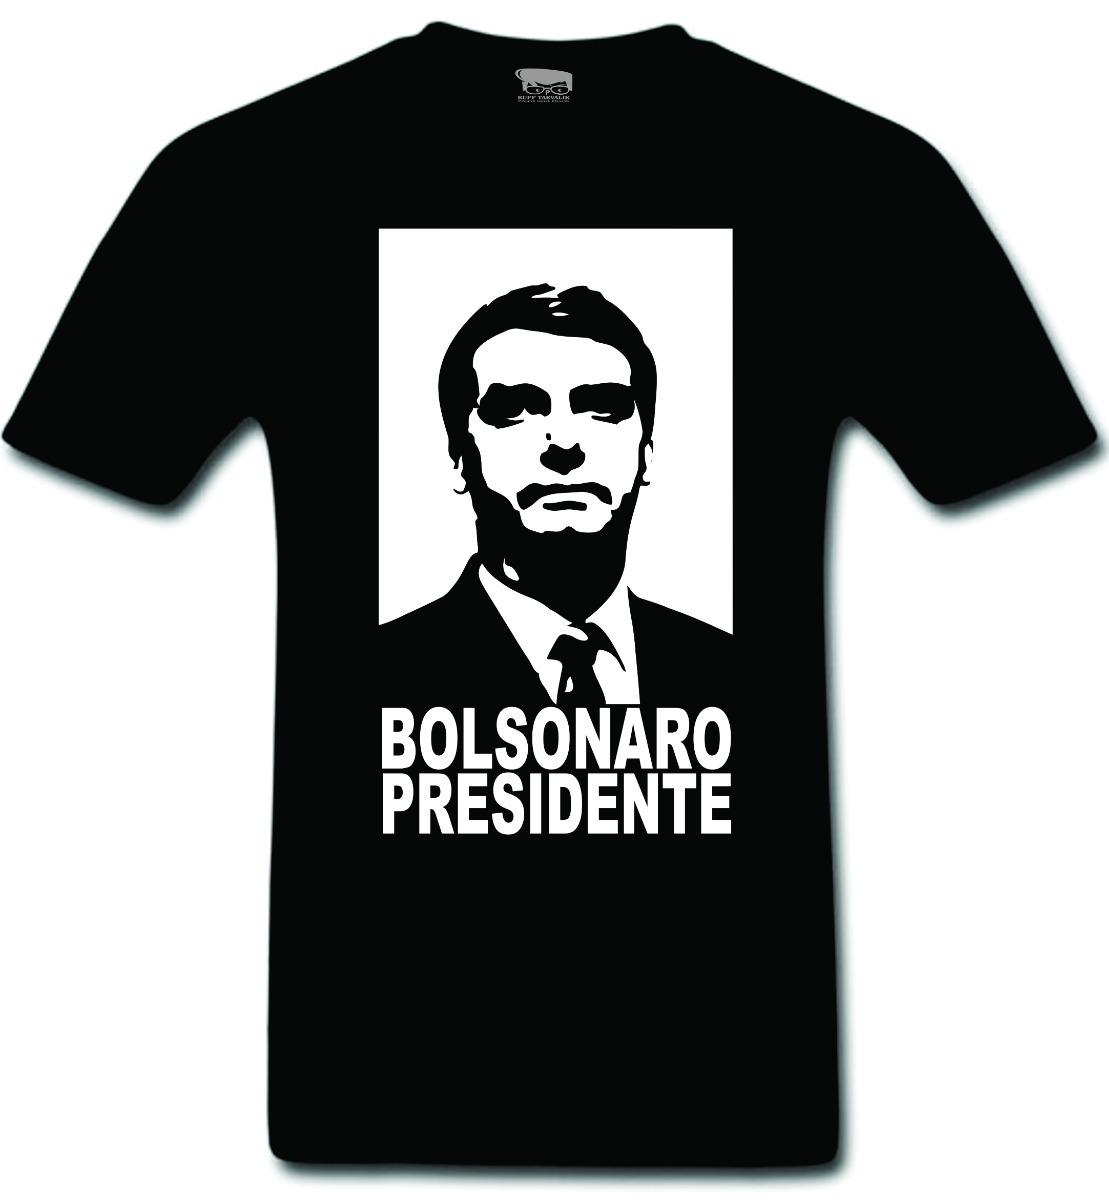 ab1b5abb2510c camiseta bolsonaro presidente melhor jair se acostumando. Carregando zoom.